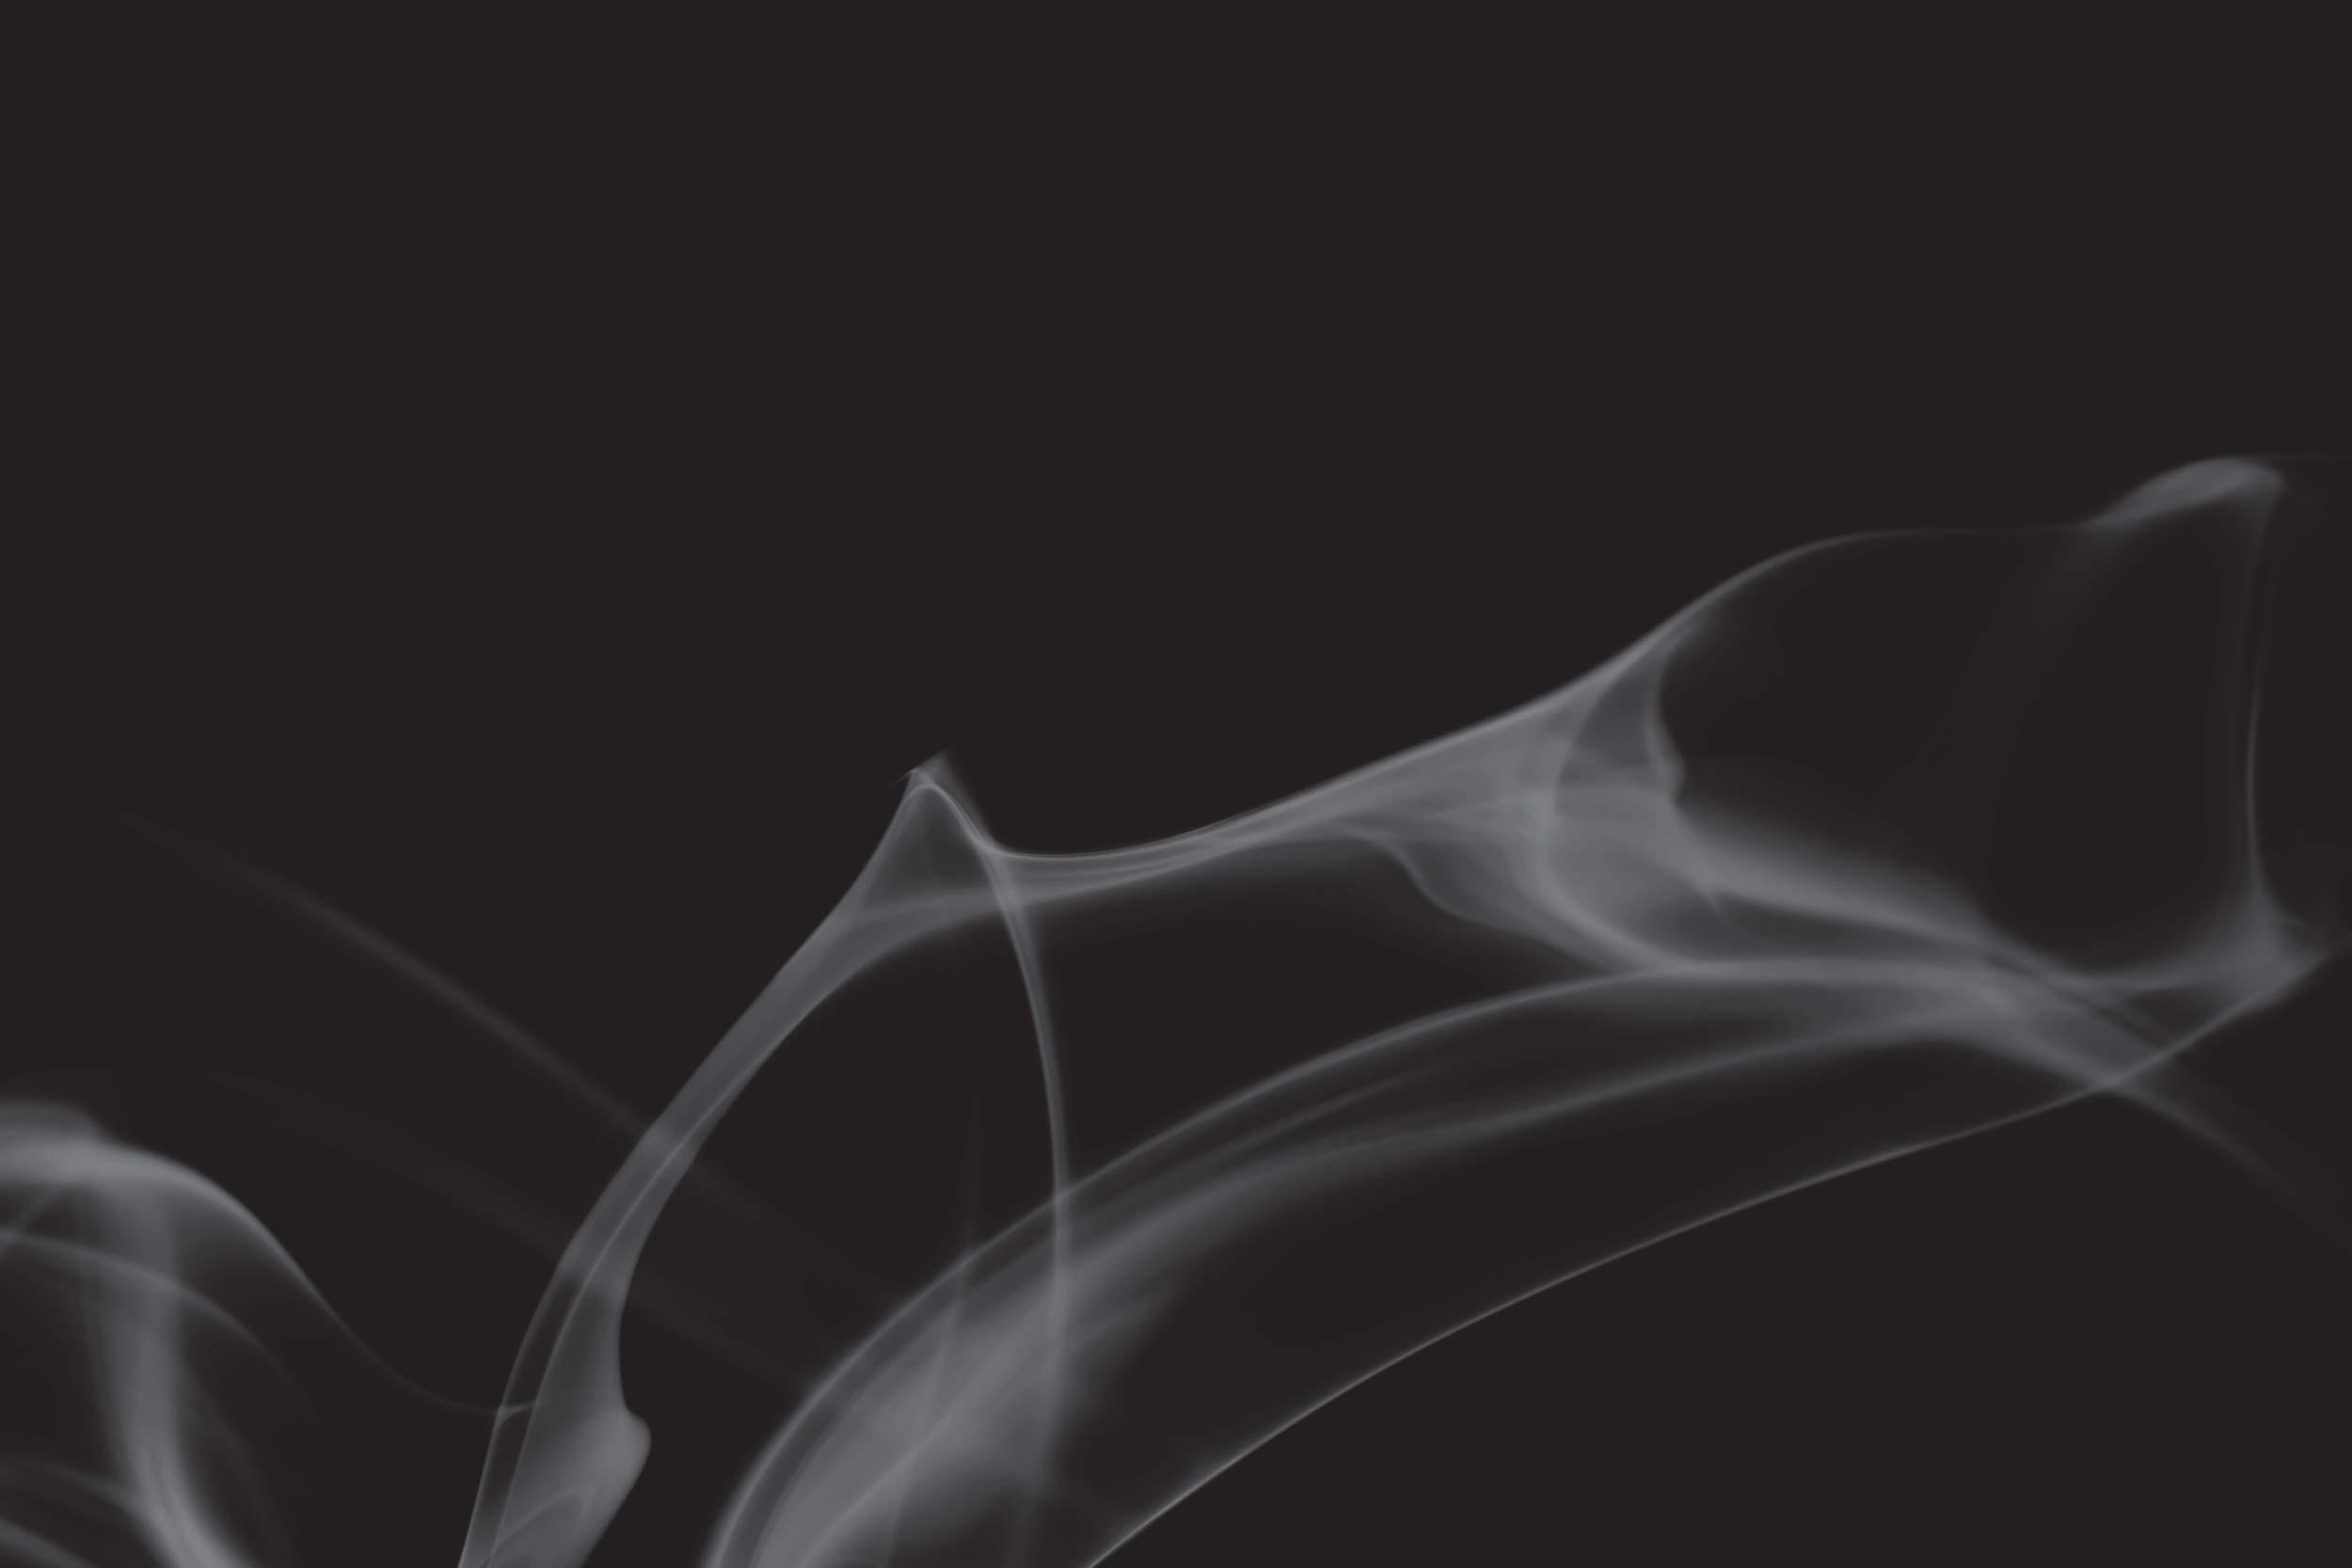 Electronic cigarettes Richmond